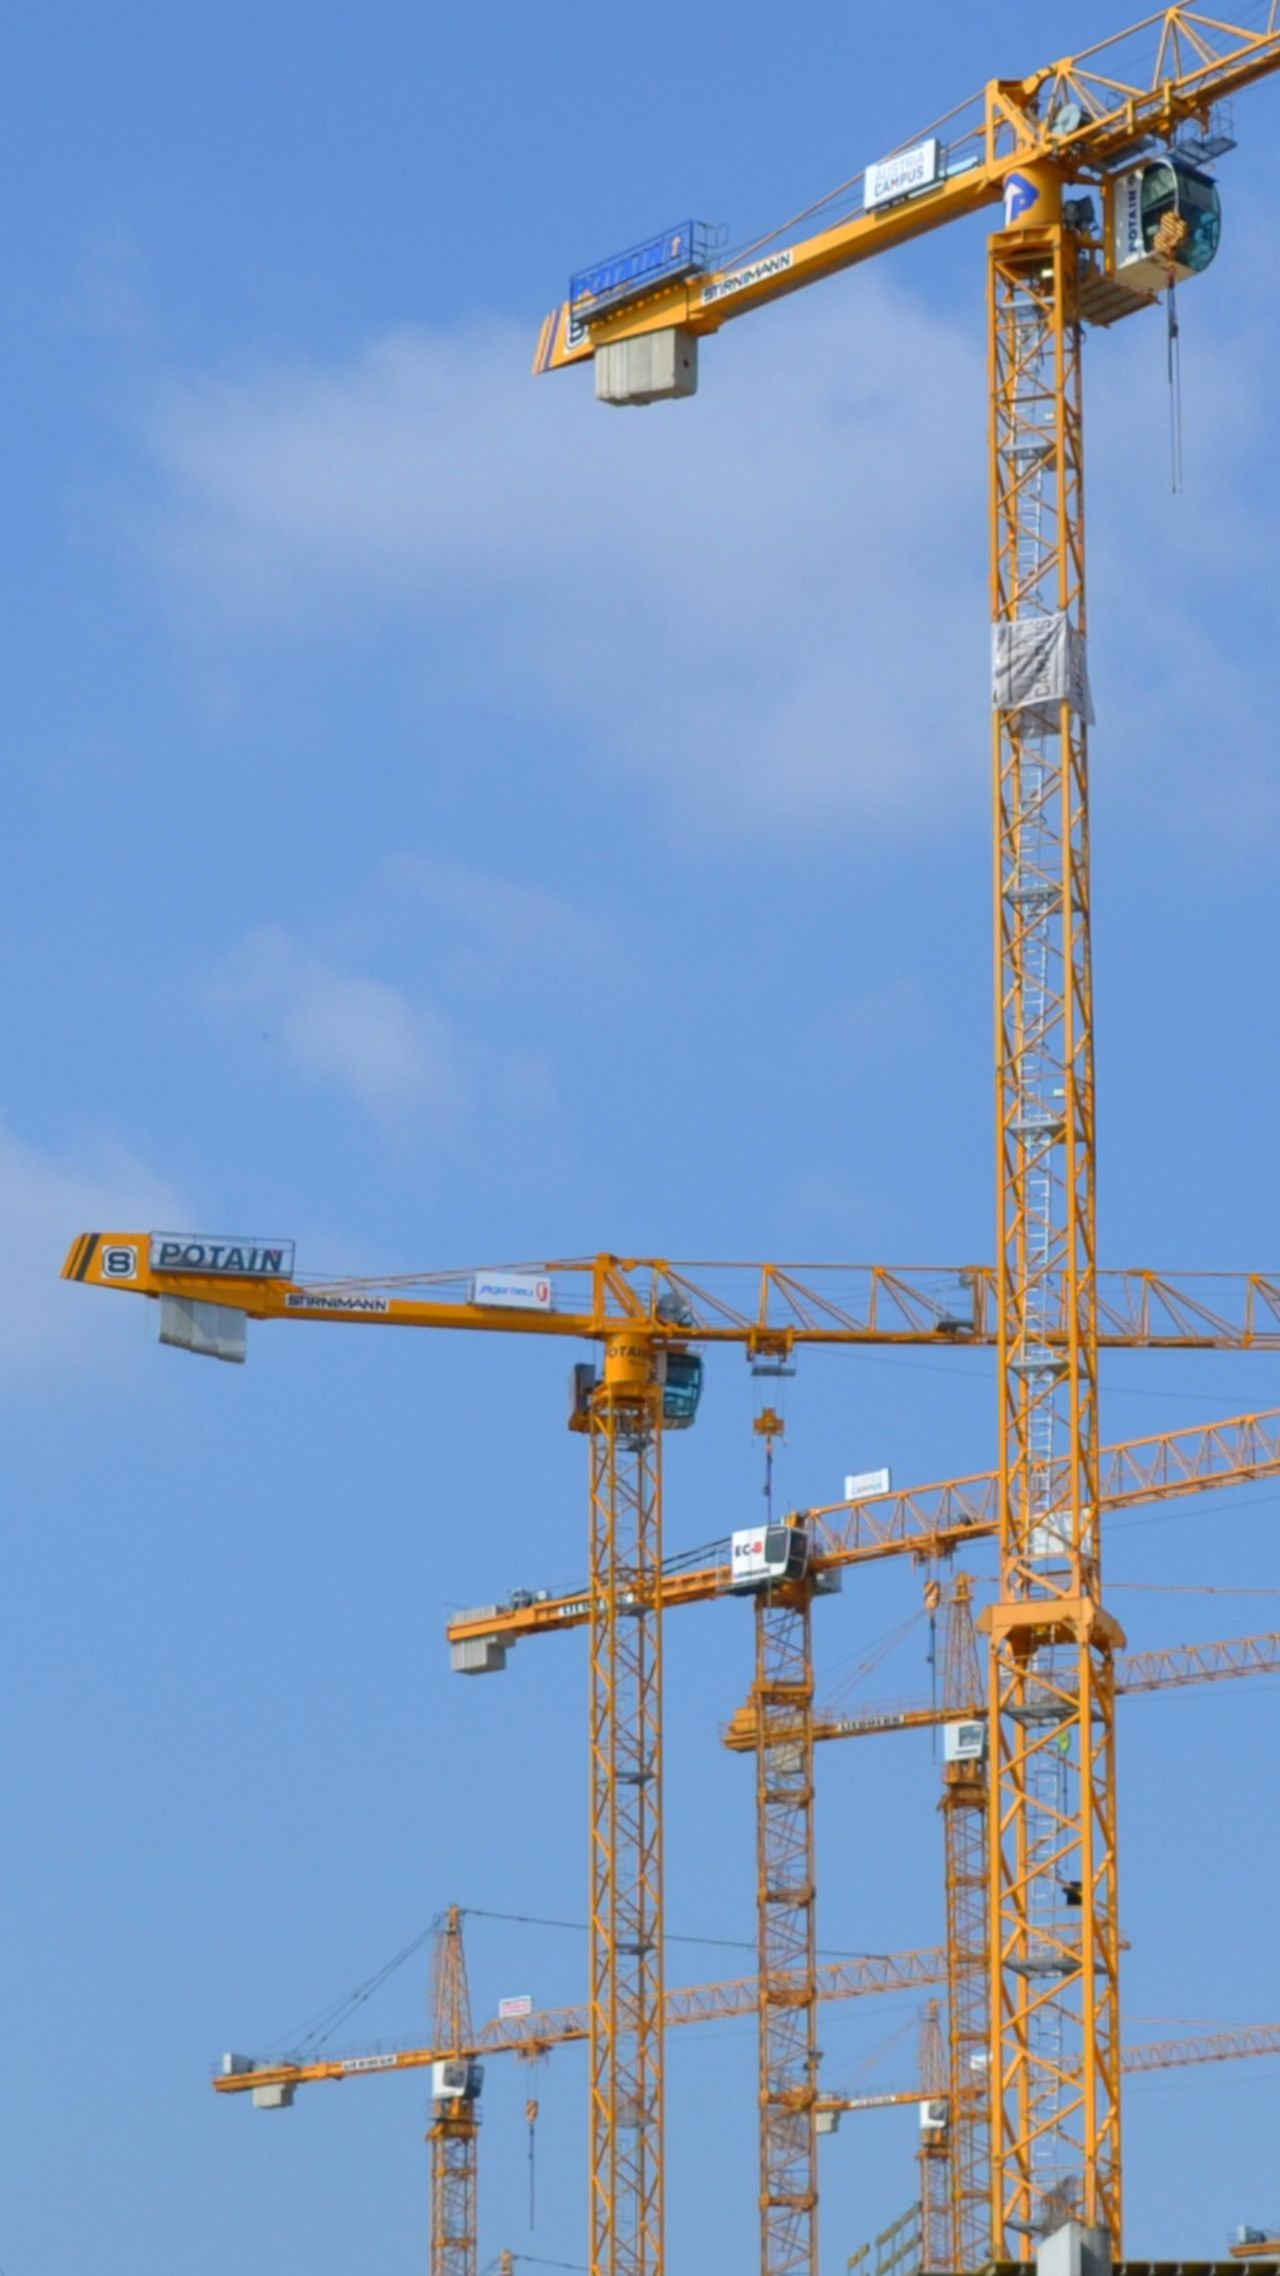 Crane Yellow Building Buildings & Sky Built Structure Crane Truck Cranes And Construction Craneporn Cranes BuildingPorn Crane - Construction Machinery Machine Cranespotting Machine Part Machinery Art Sky